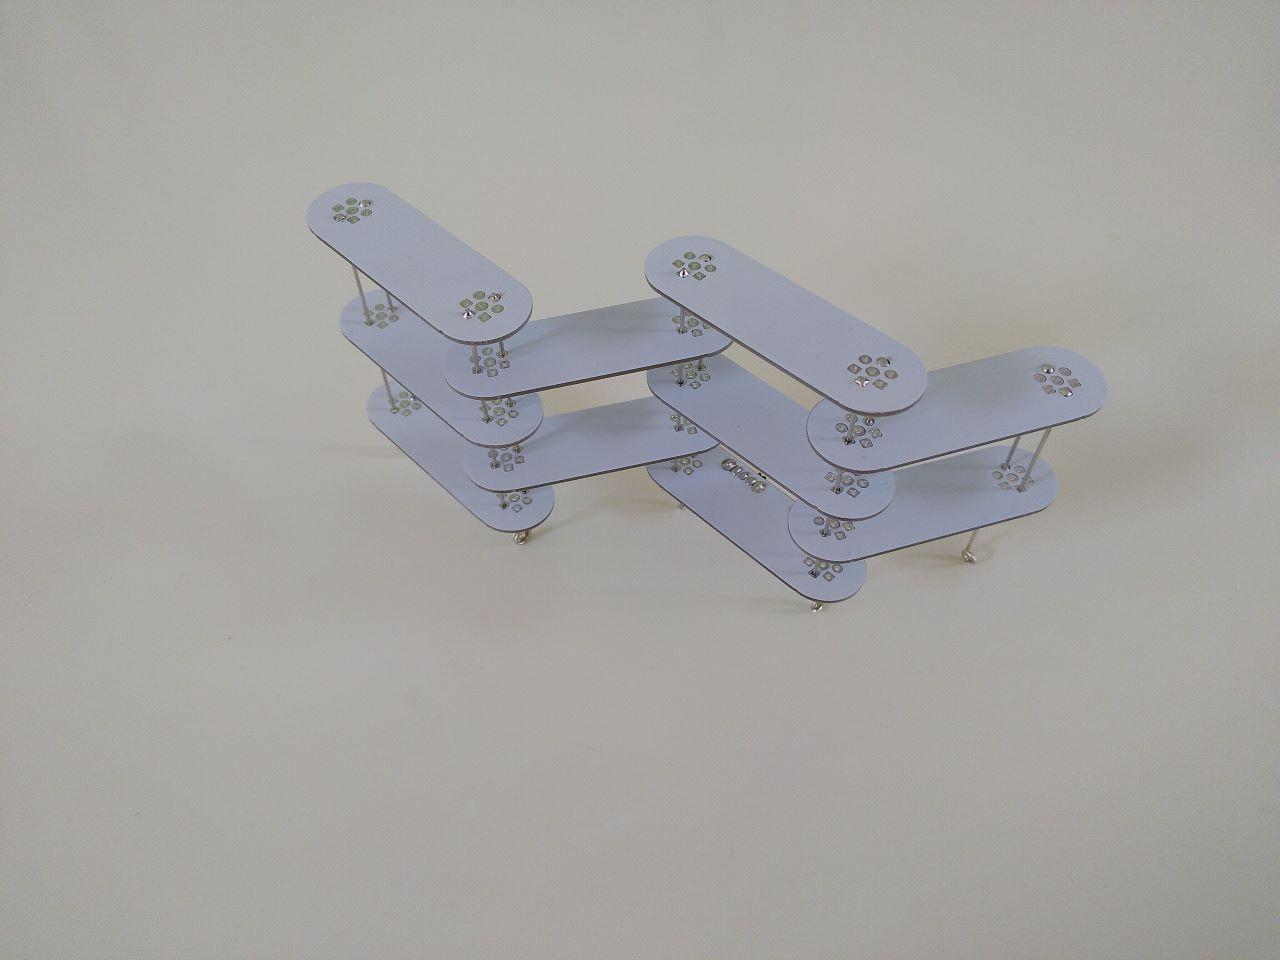 Moduli DIY Modular Light Kit